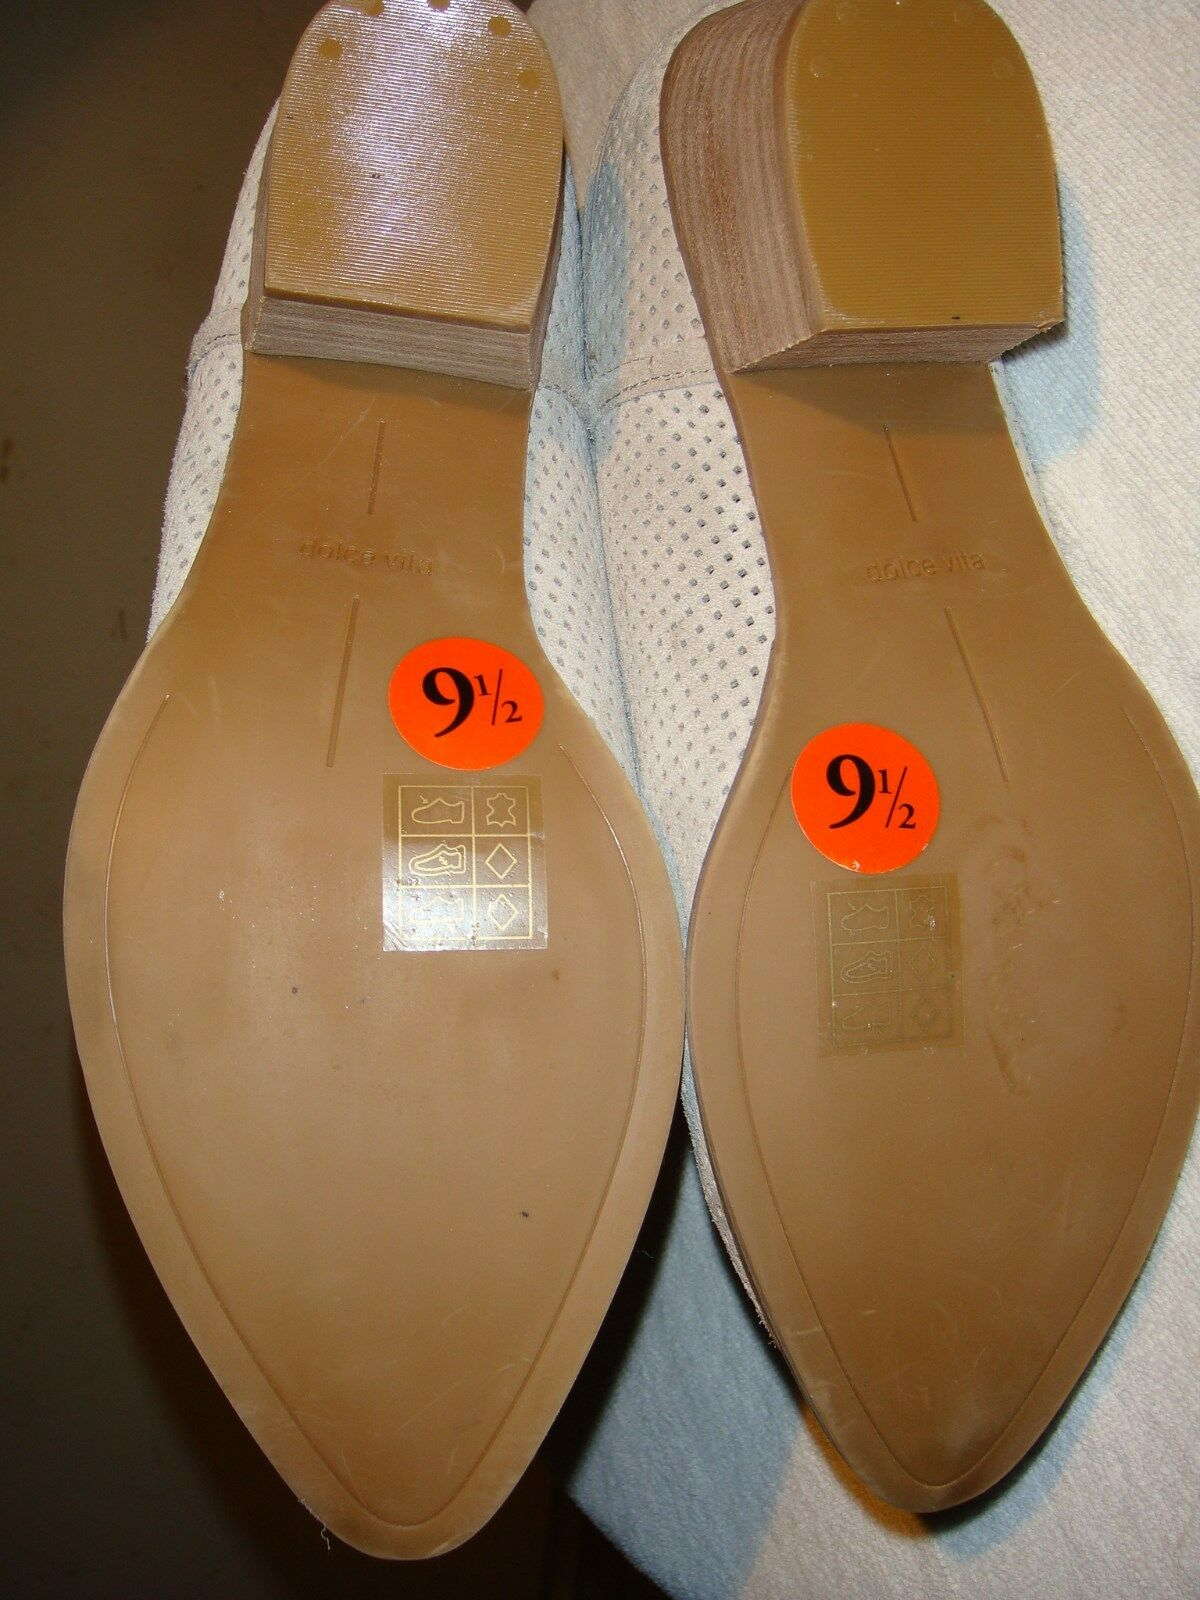 New Ladies,Dolca Vita, Tan Suede Ankle Boot, Buckle,Slipon, Buckle,Slipon, Buckle,Slipon, Size- 9 1 2M,Cute f2eda4